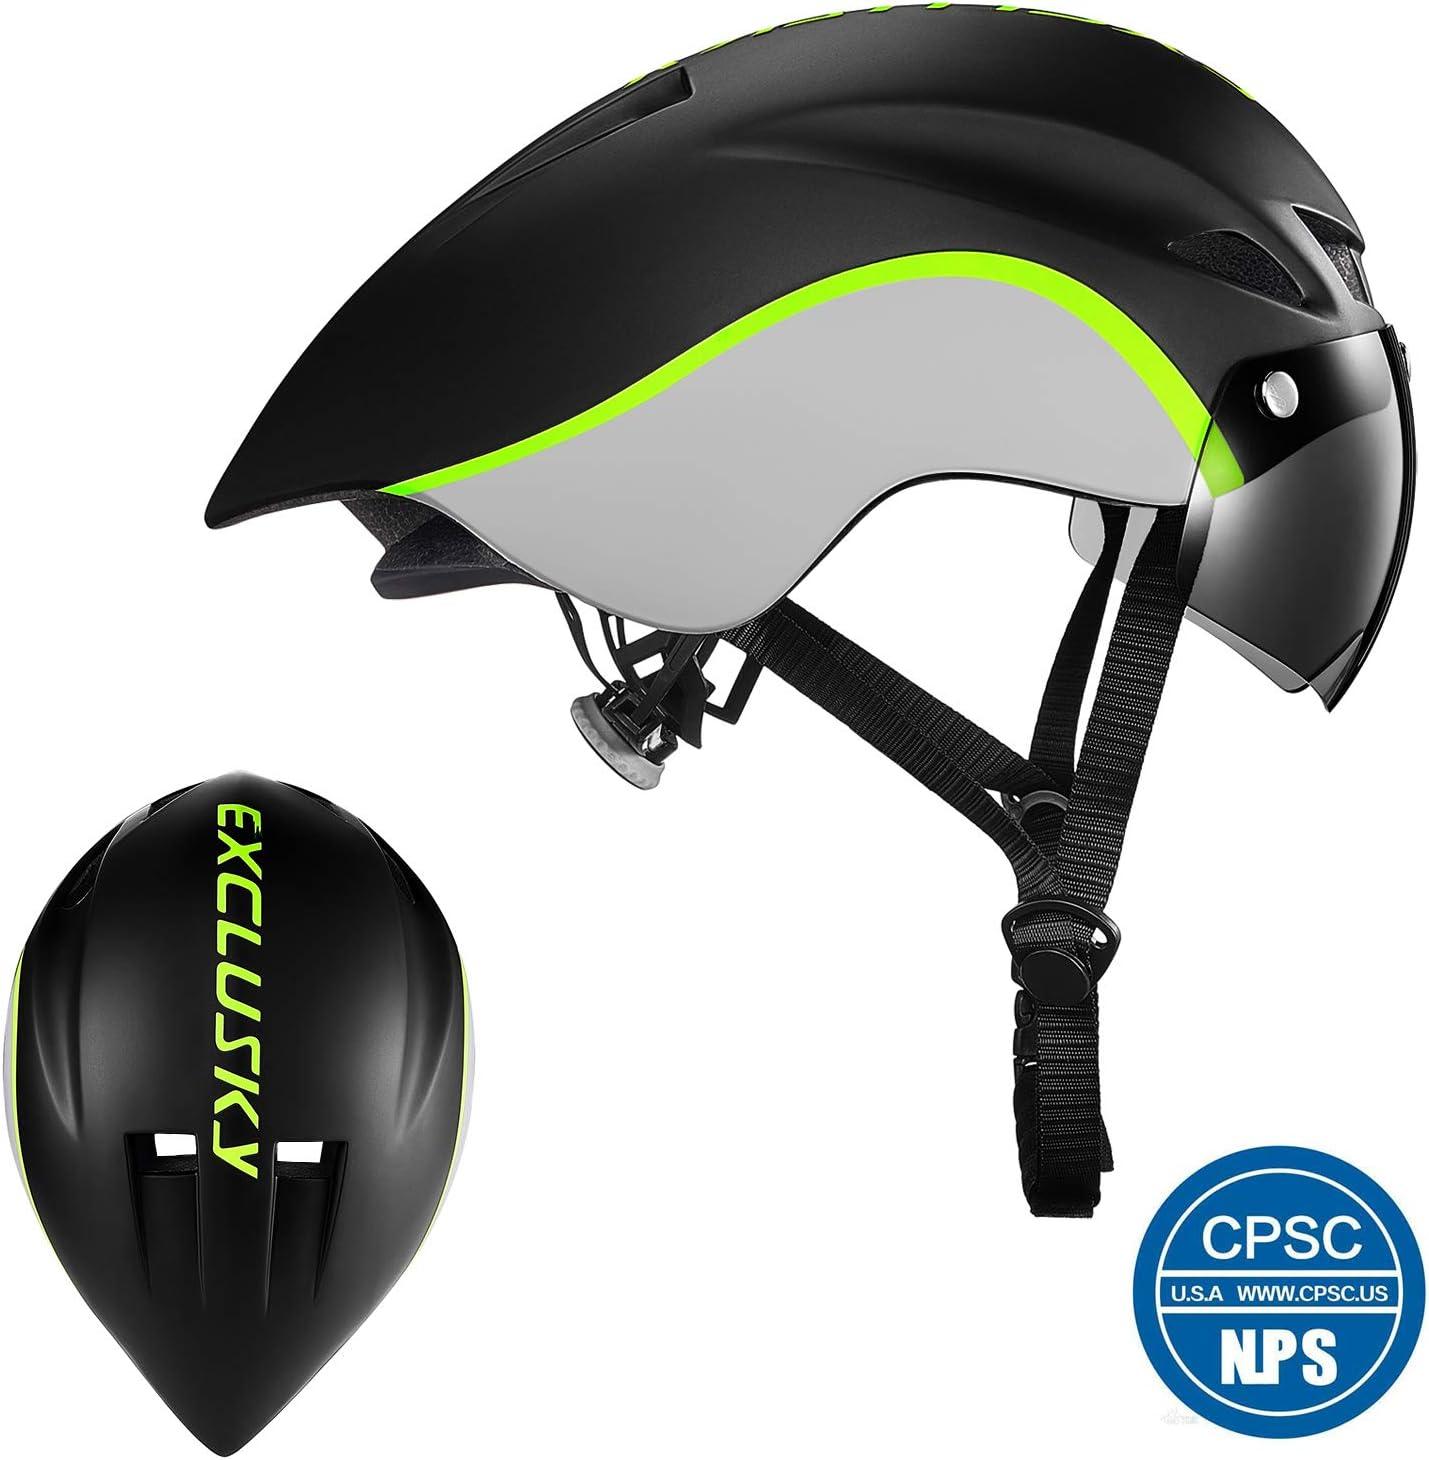 Exclusky Aero Bike Helmet with Removable Shield Visor Time Trial for Men Women, TT Triathlon Helmet for Road Bike, Cycling